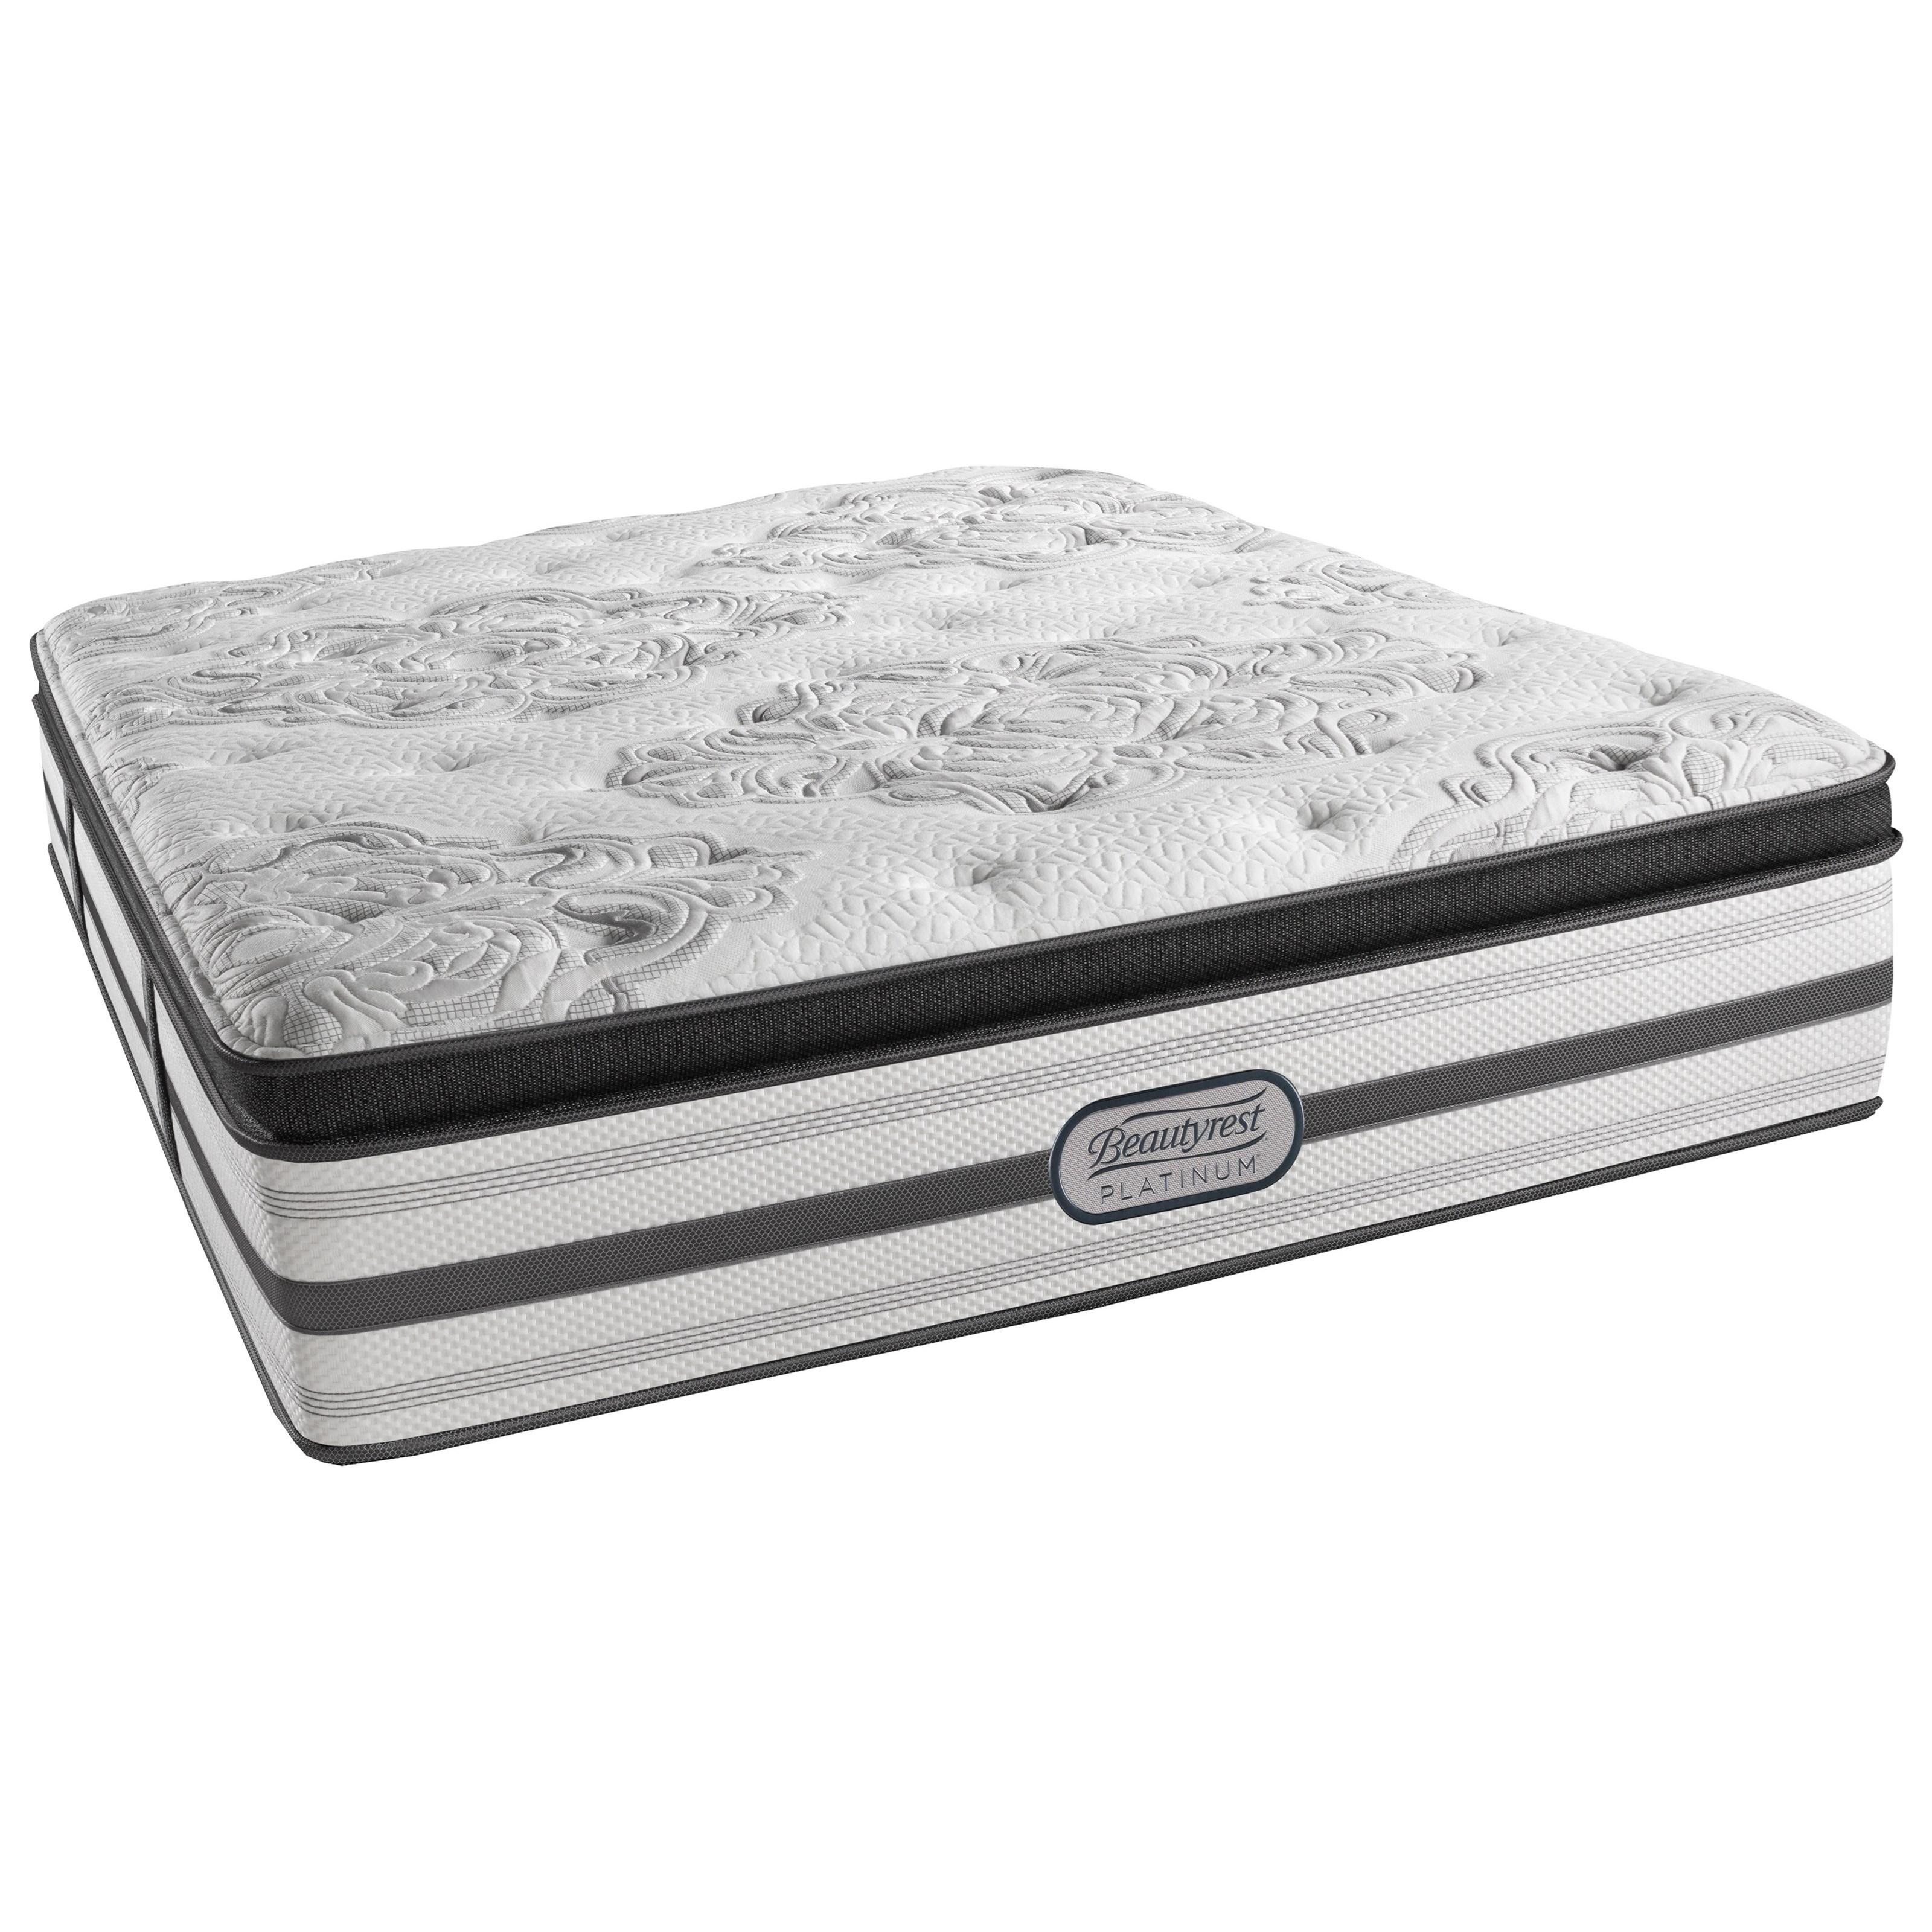 Beautyrest Platinum Gabriella Twin XL Lux Firm Pillow Top Adjustable Set - Item Number: LV3LFPT-TXL+SM2-TXL